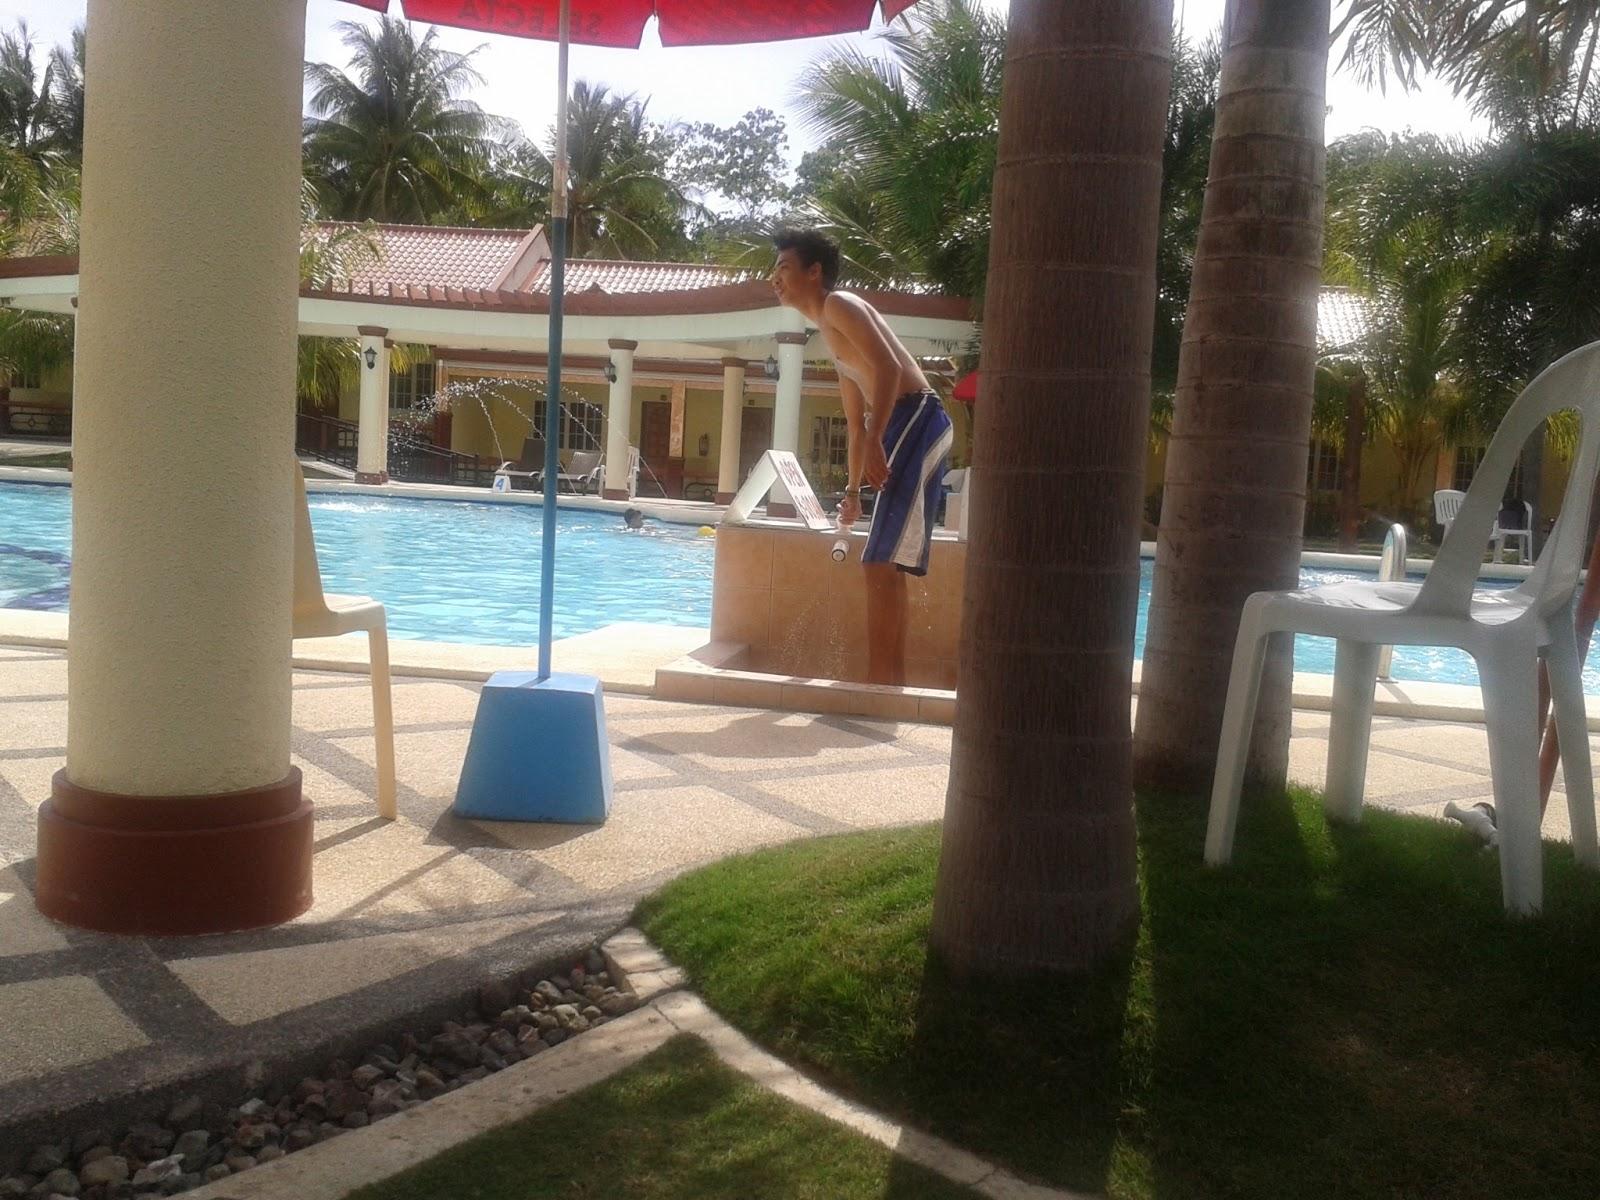 Hagnaya Beach Resort and Restaurant with Zadiel, Klynt and Ryan